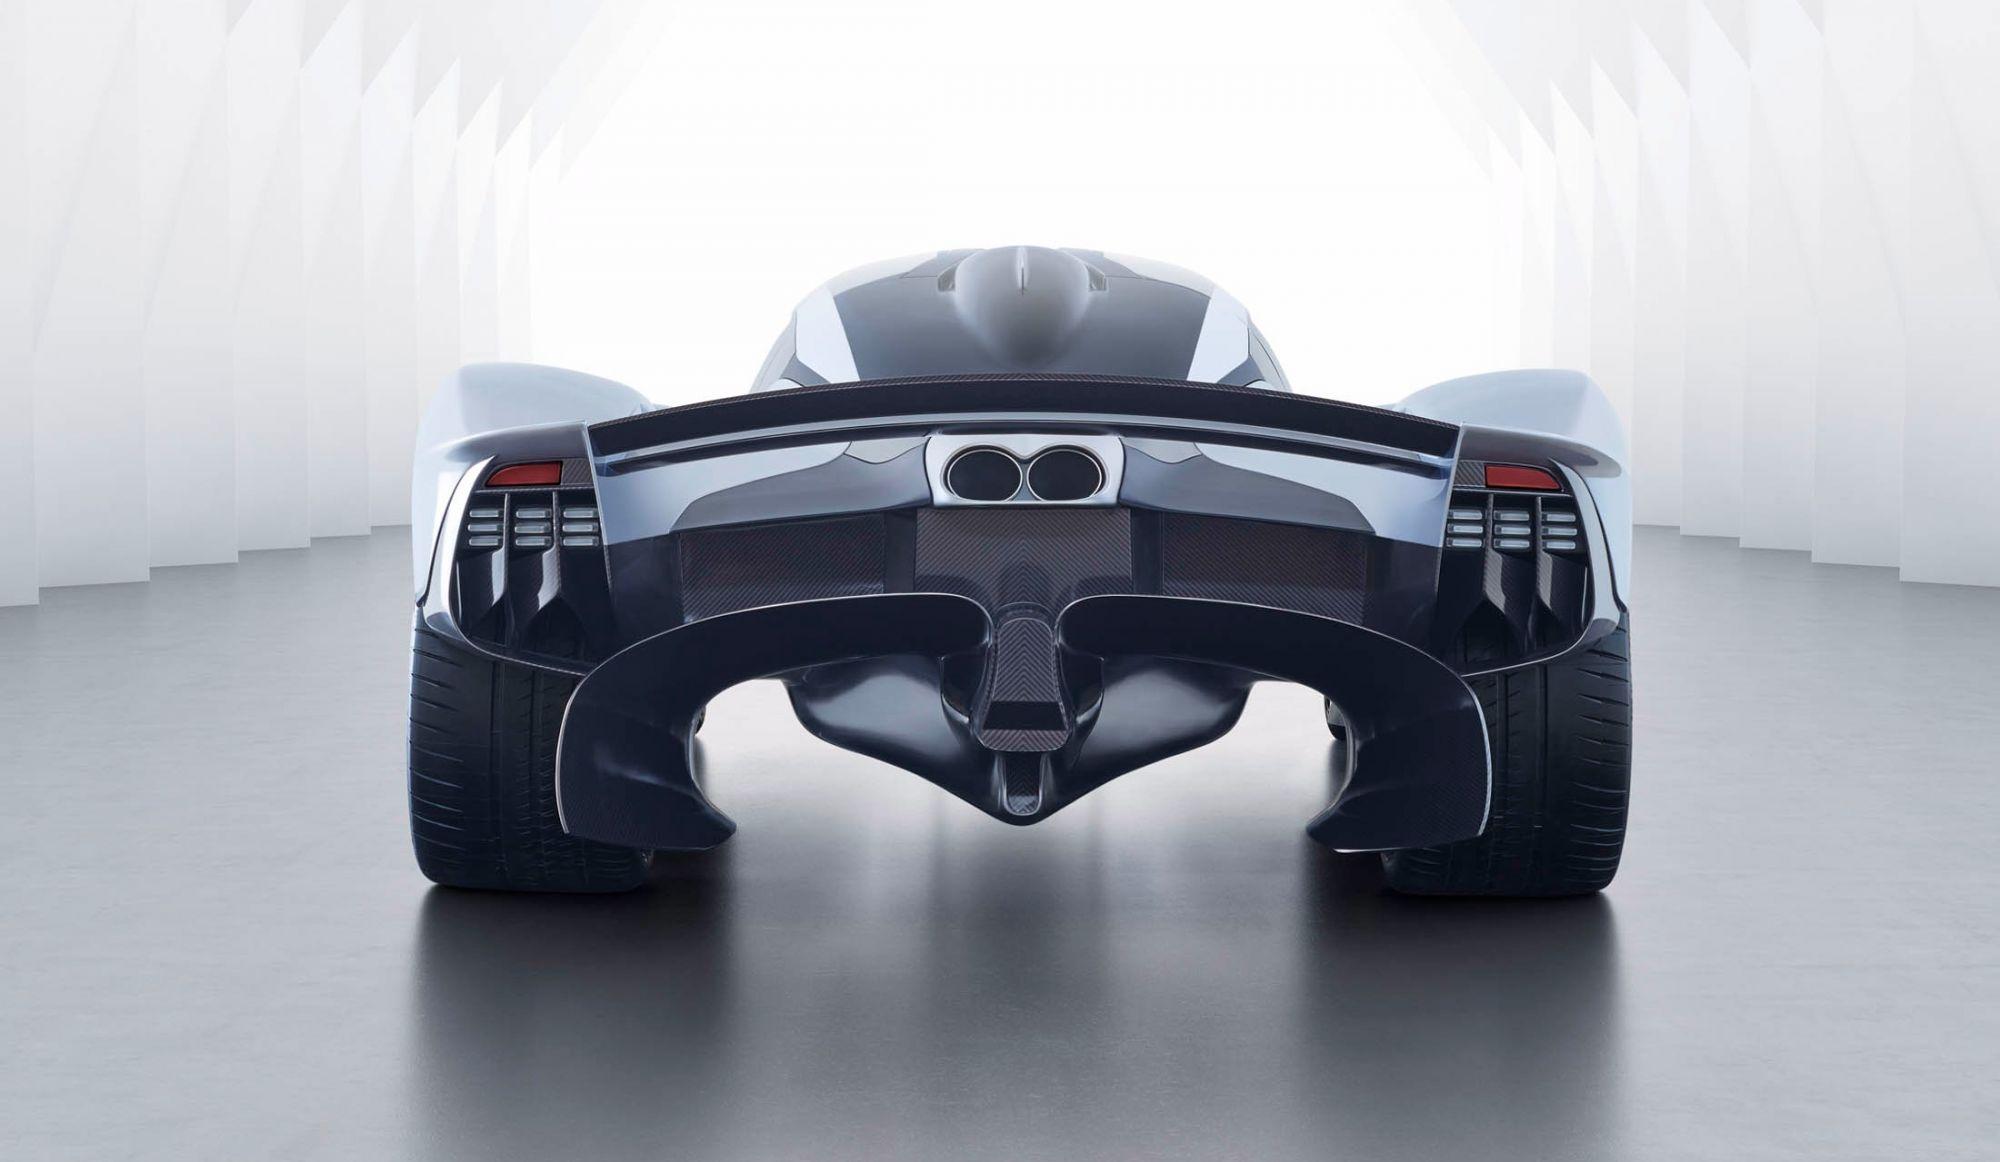 Voici la Aston Martin Valkyrie